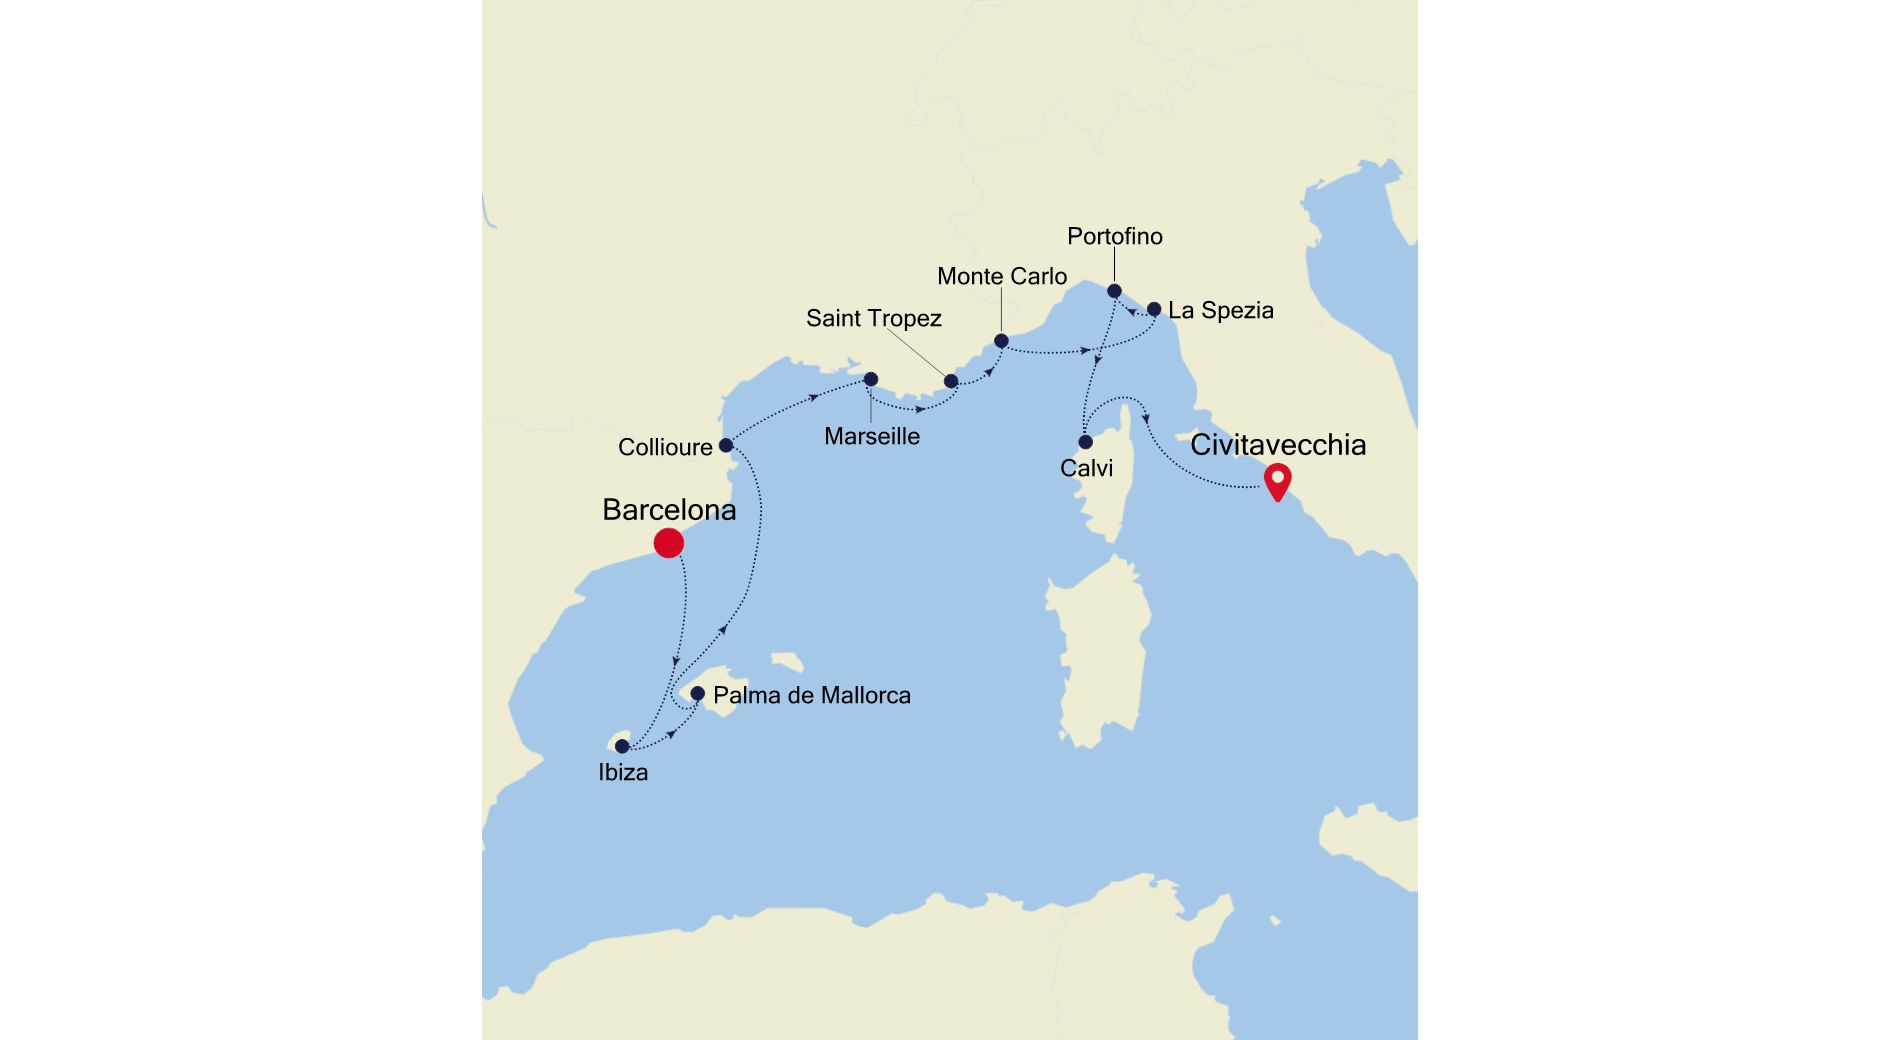 MO210716010 - Barcelona nach Civitavecchia